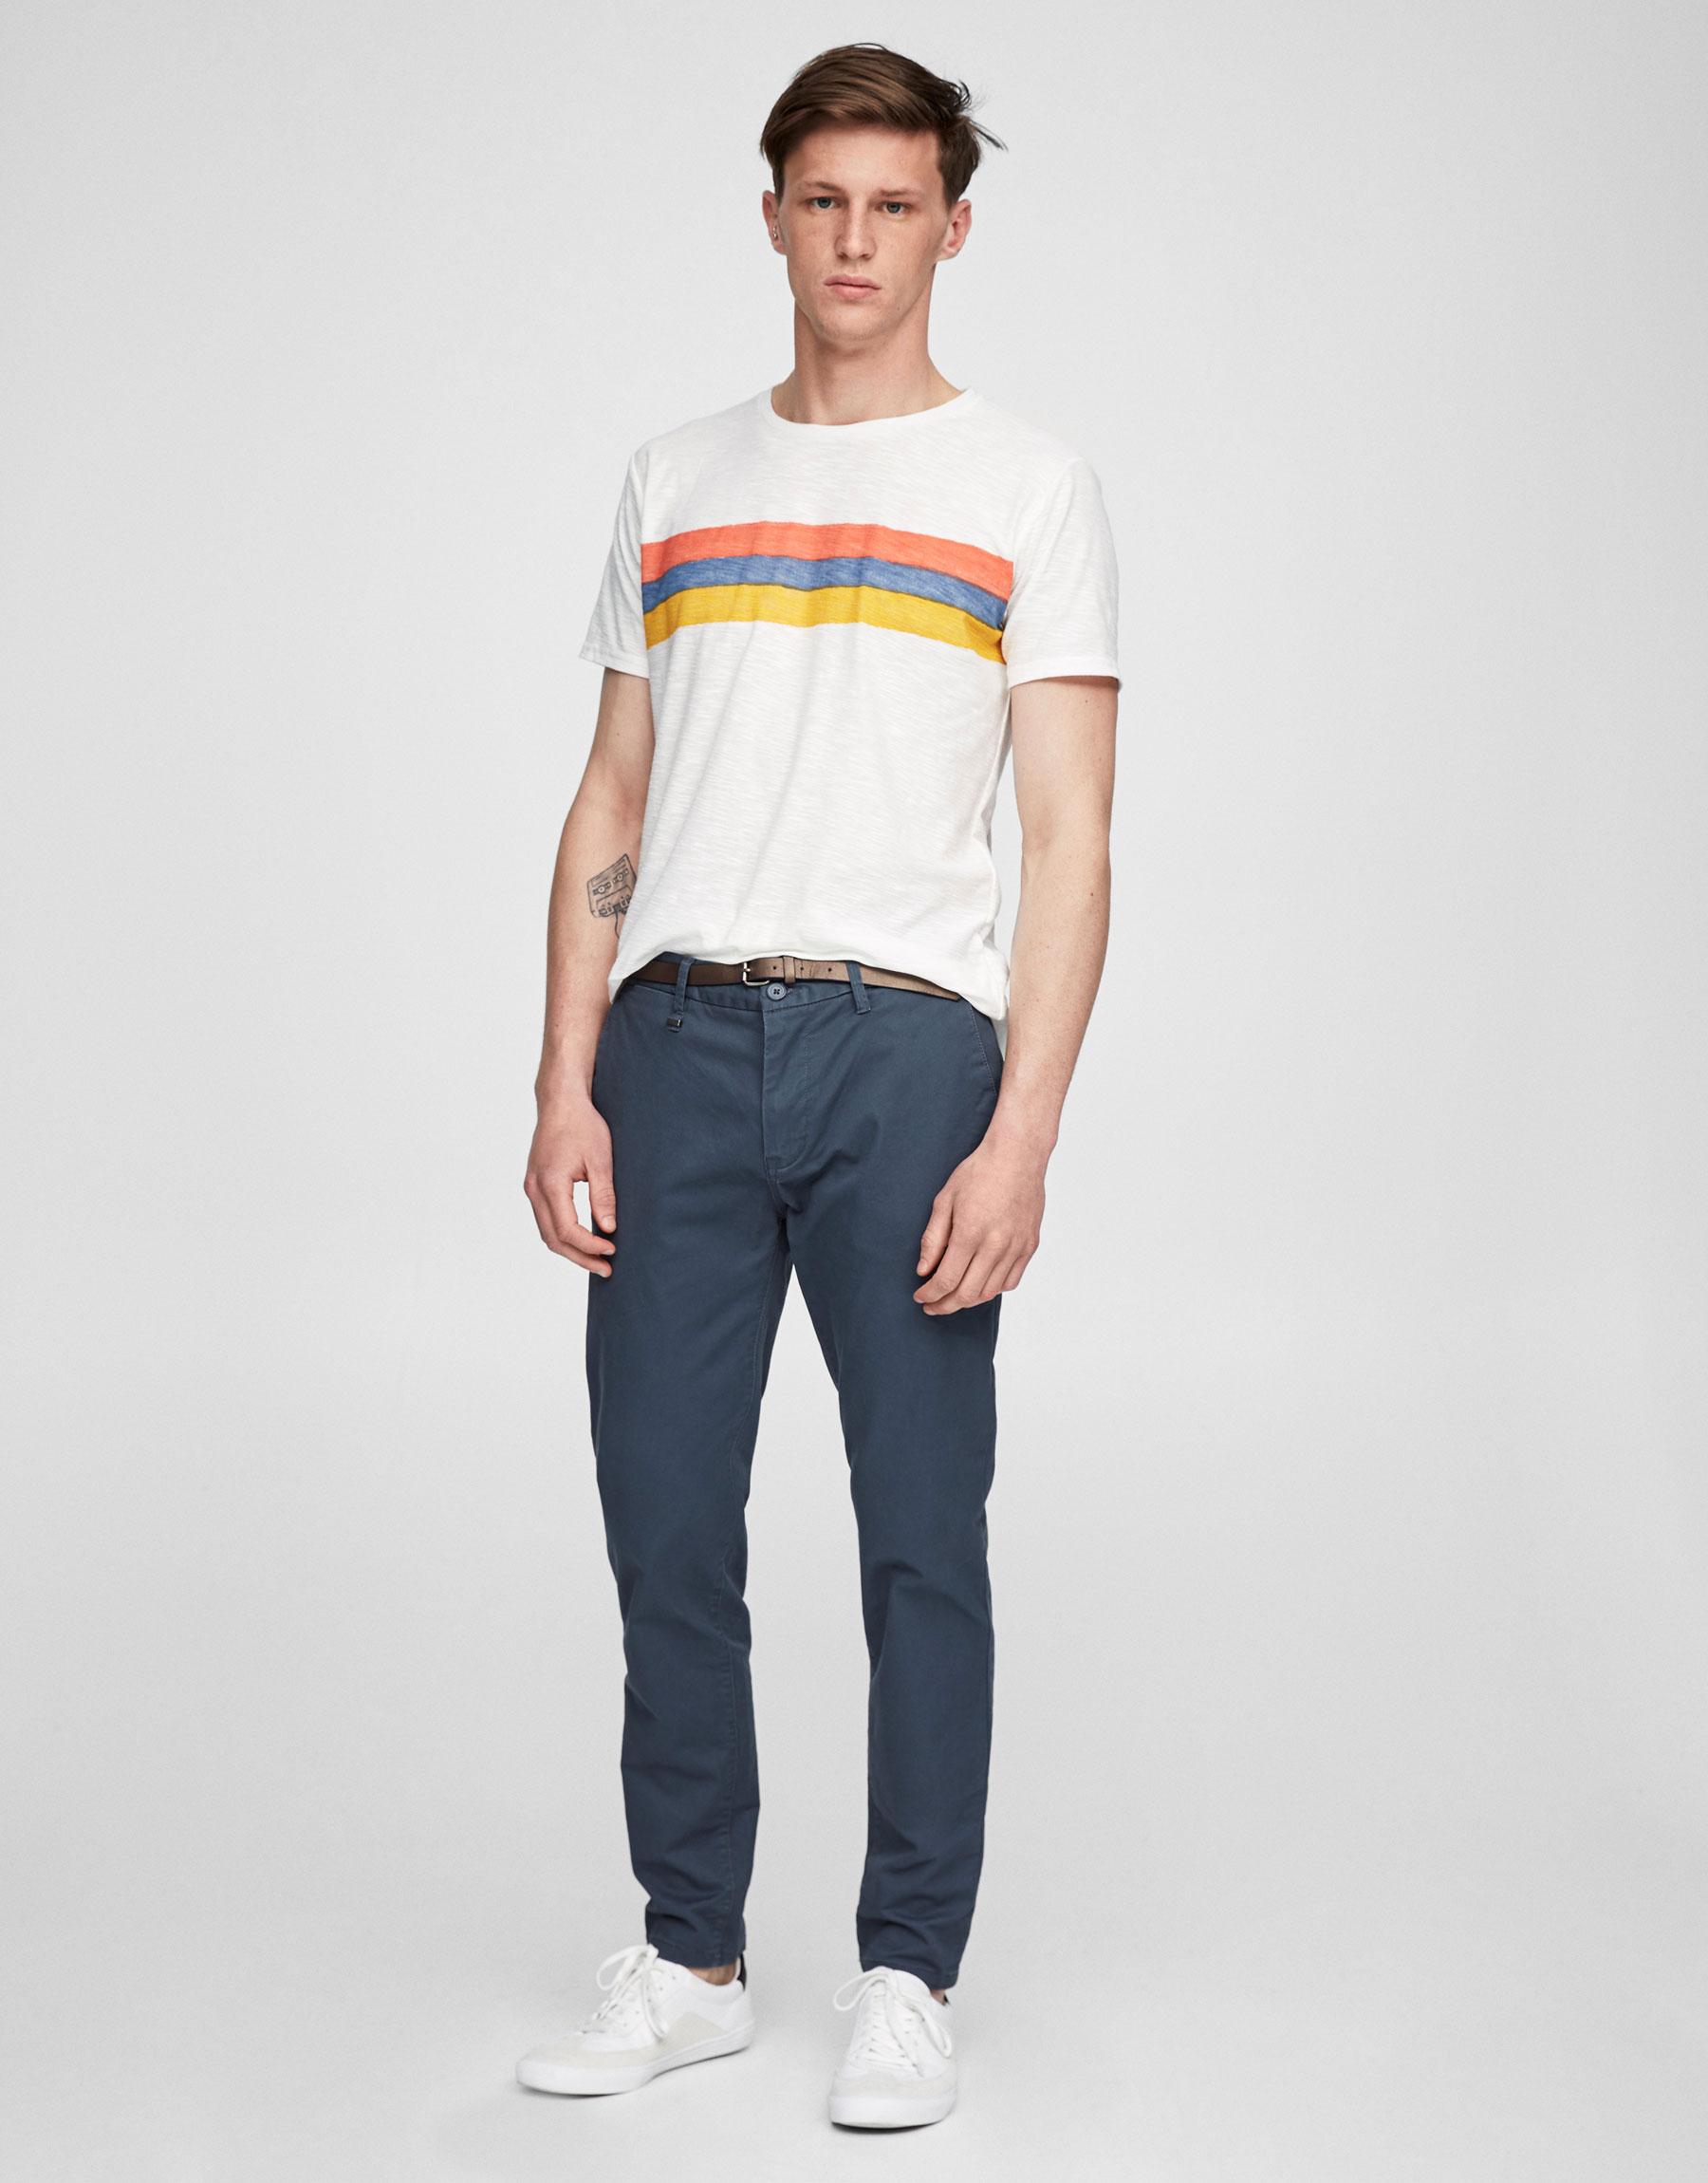 Pantalon style chino avec ceinture - Chino - Pantalons - Vêtements - Homme - PULL&BEAR France